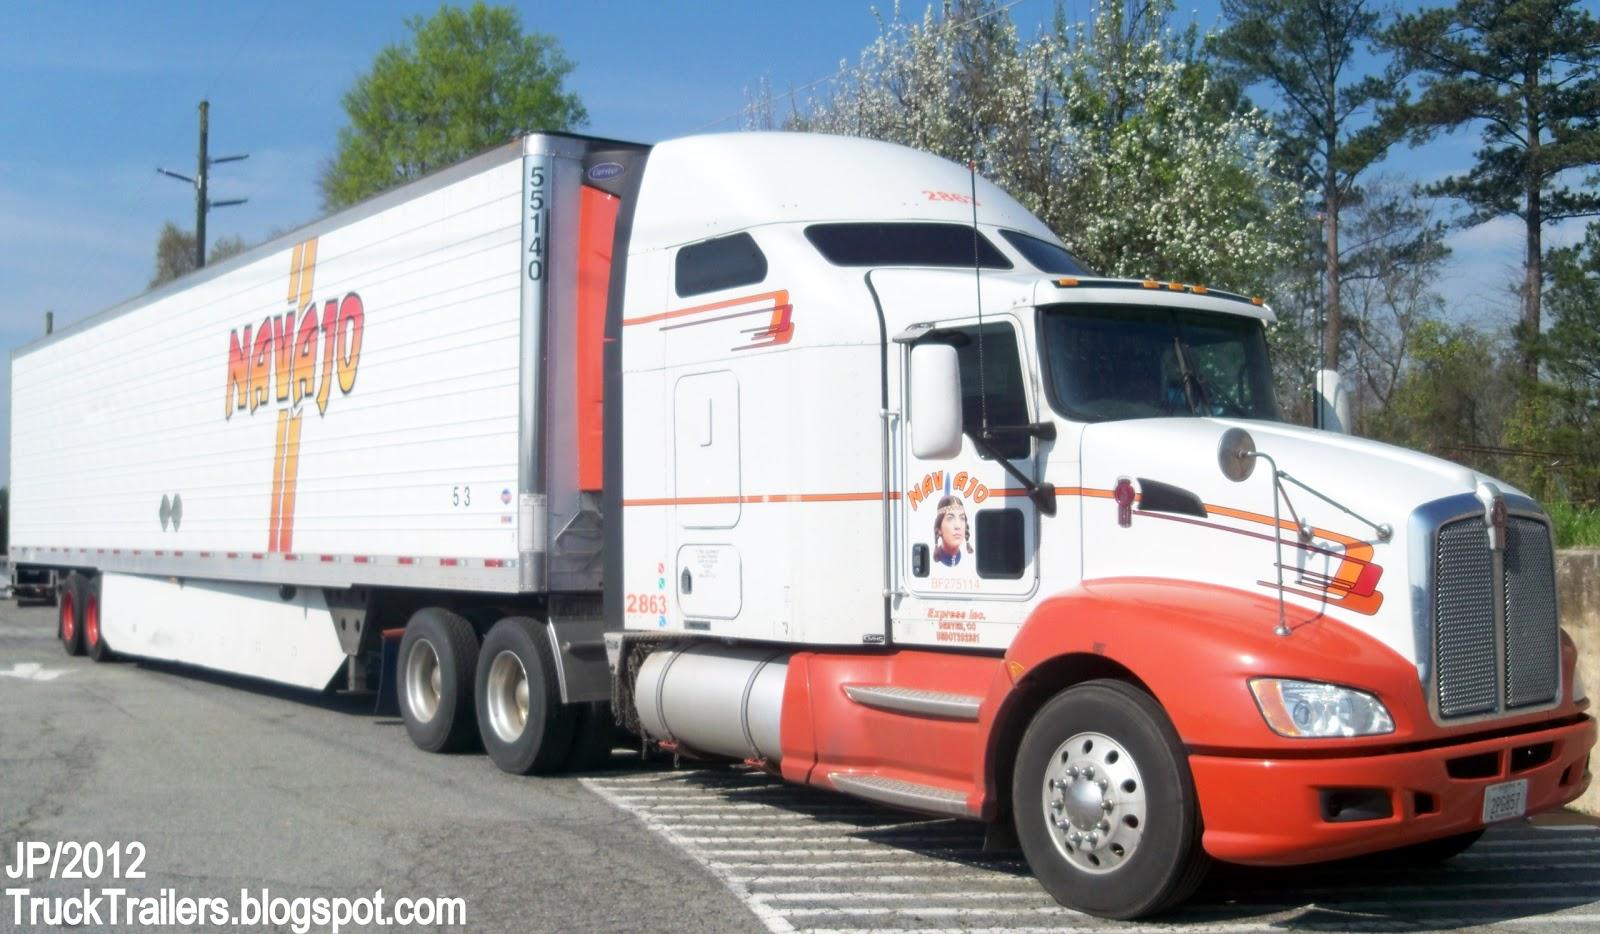 TRUCK TRAILER Trucking Express Co Logistic Diesel Image Mack